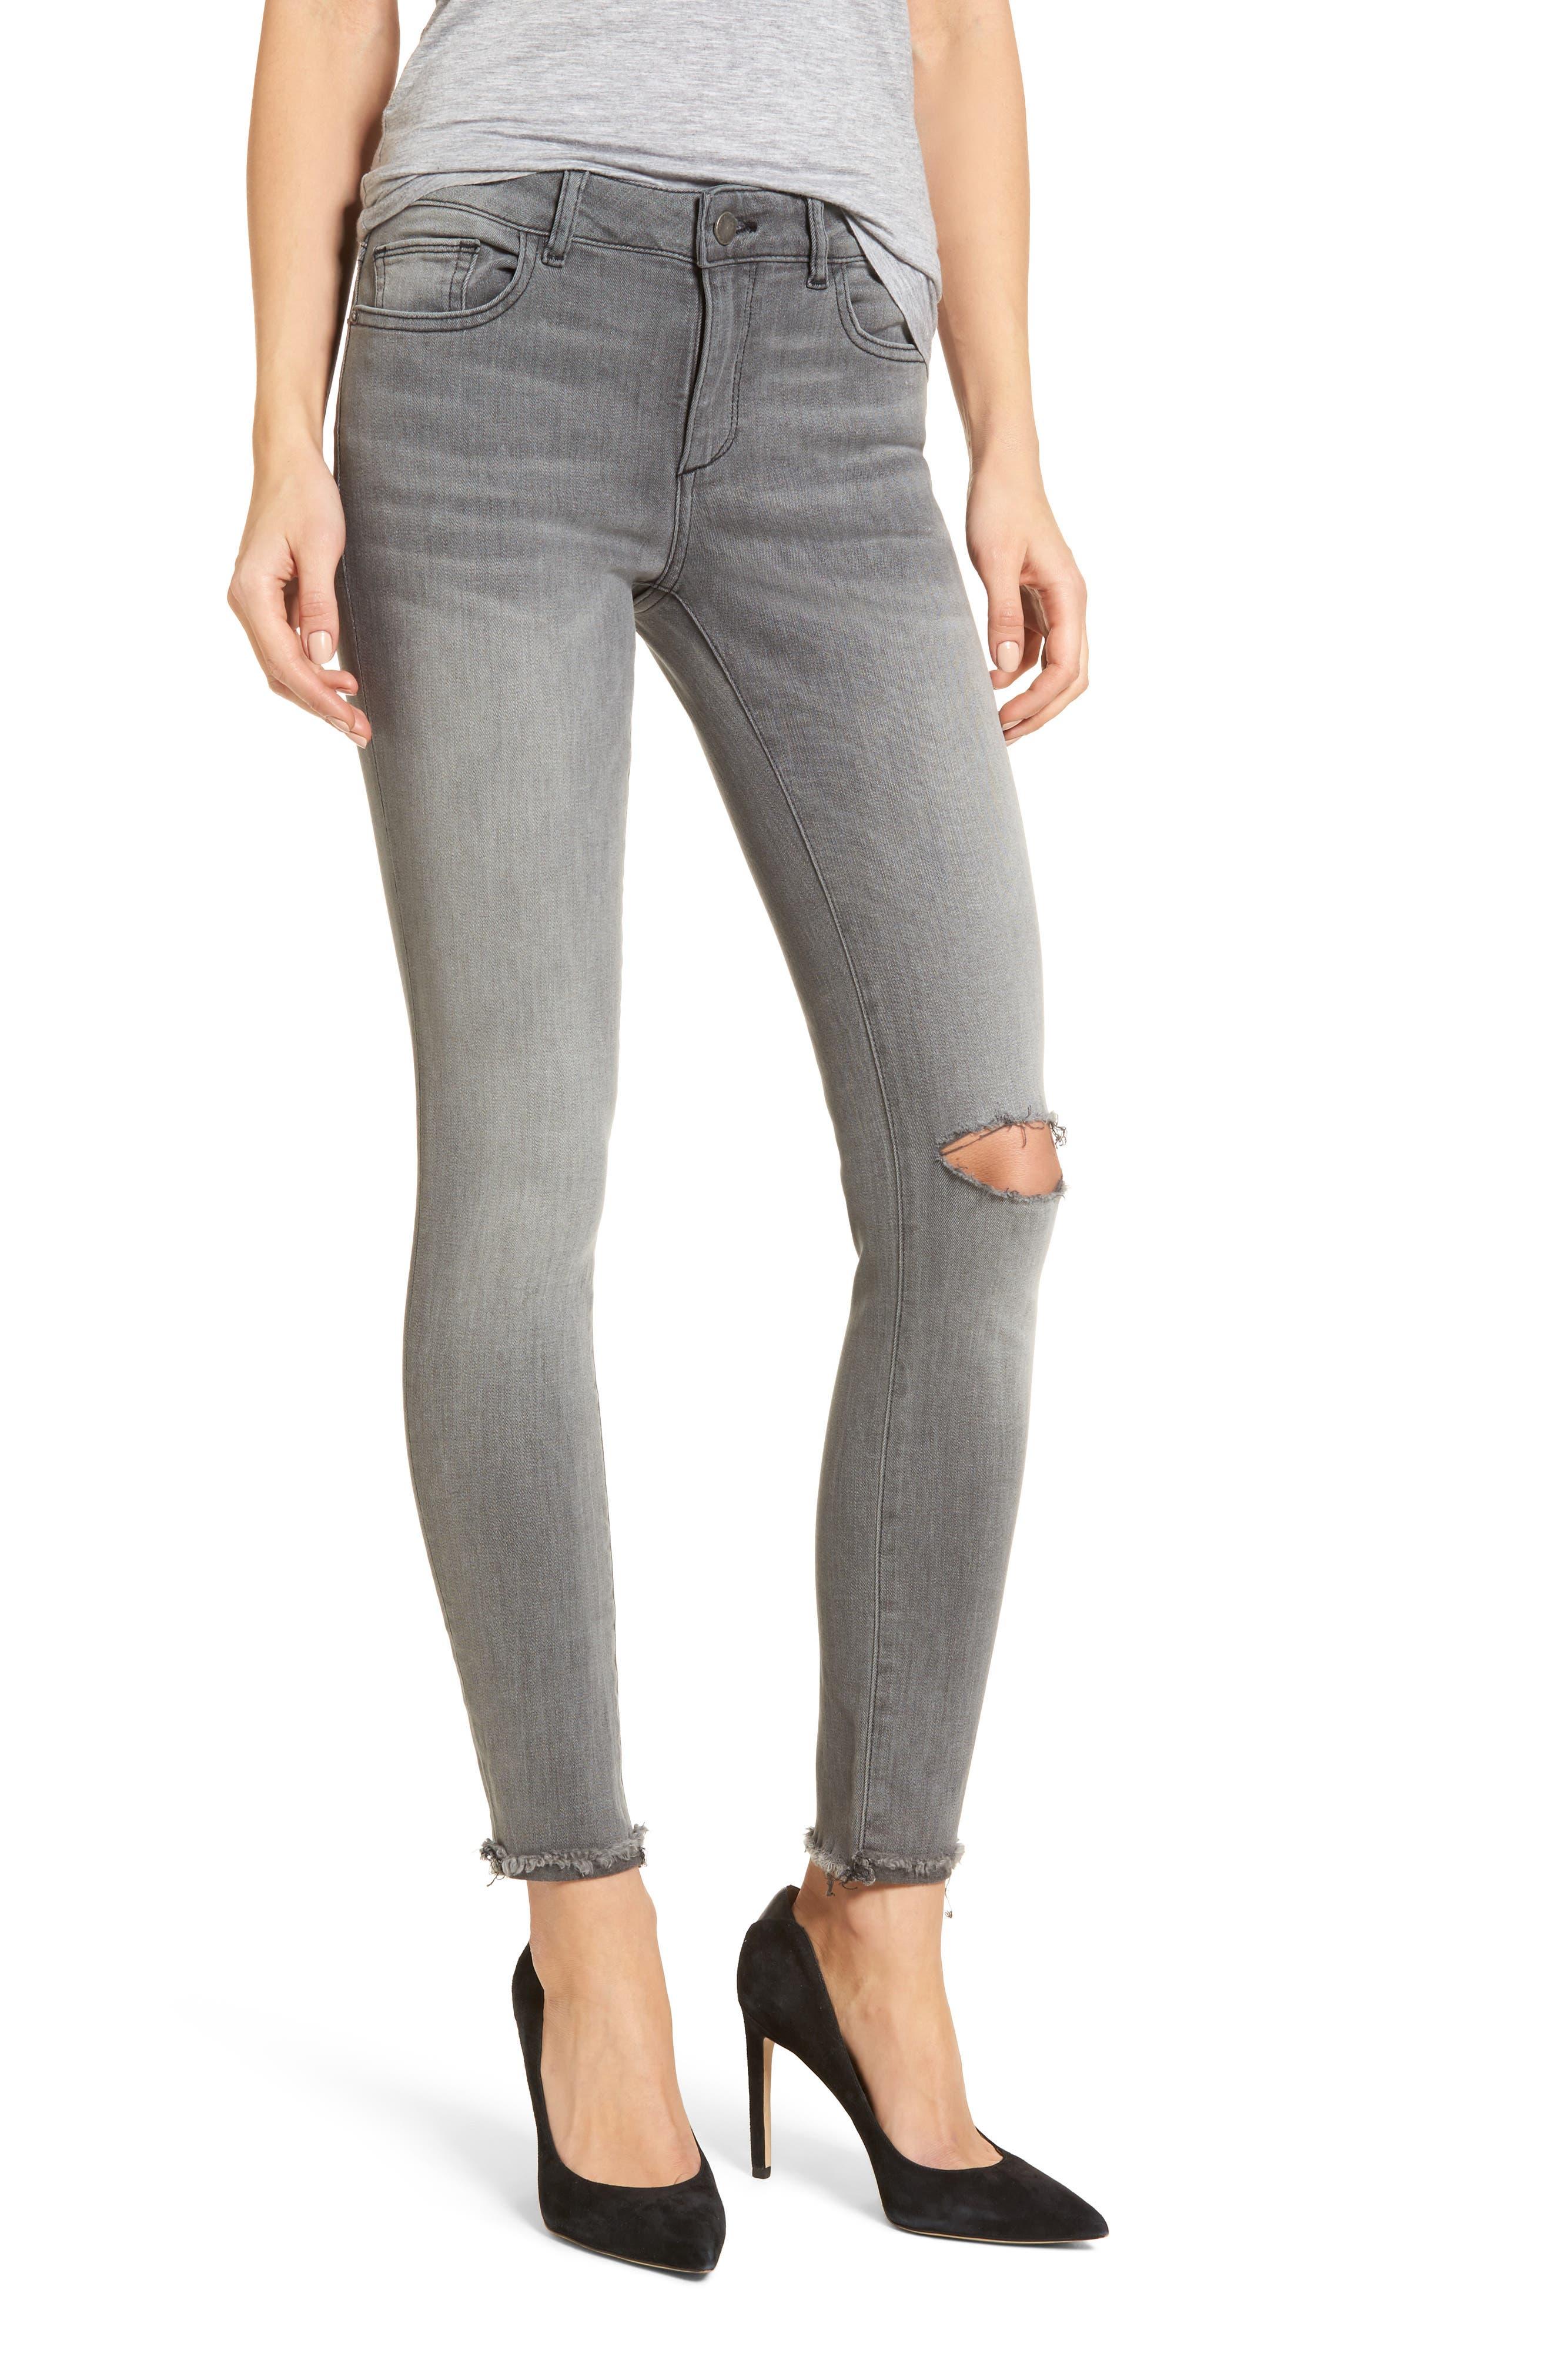 Emma Power Legging Jeans,                         Main,                         color, Tarrant